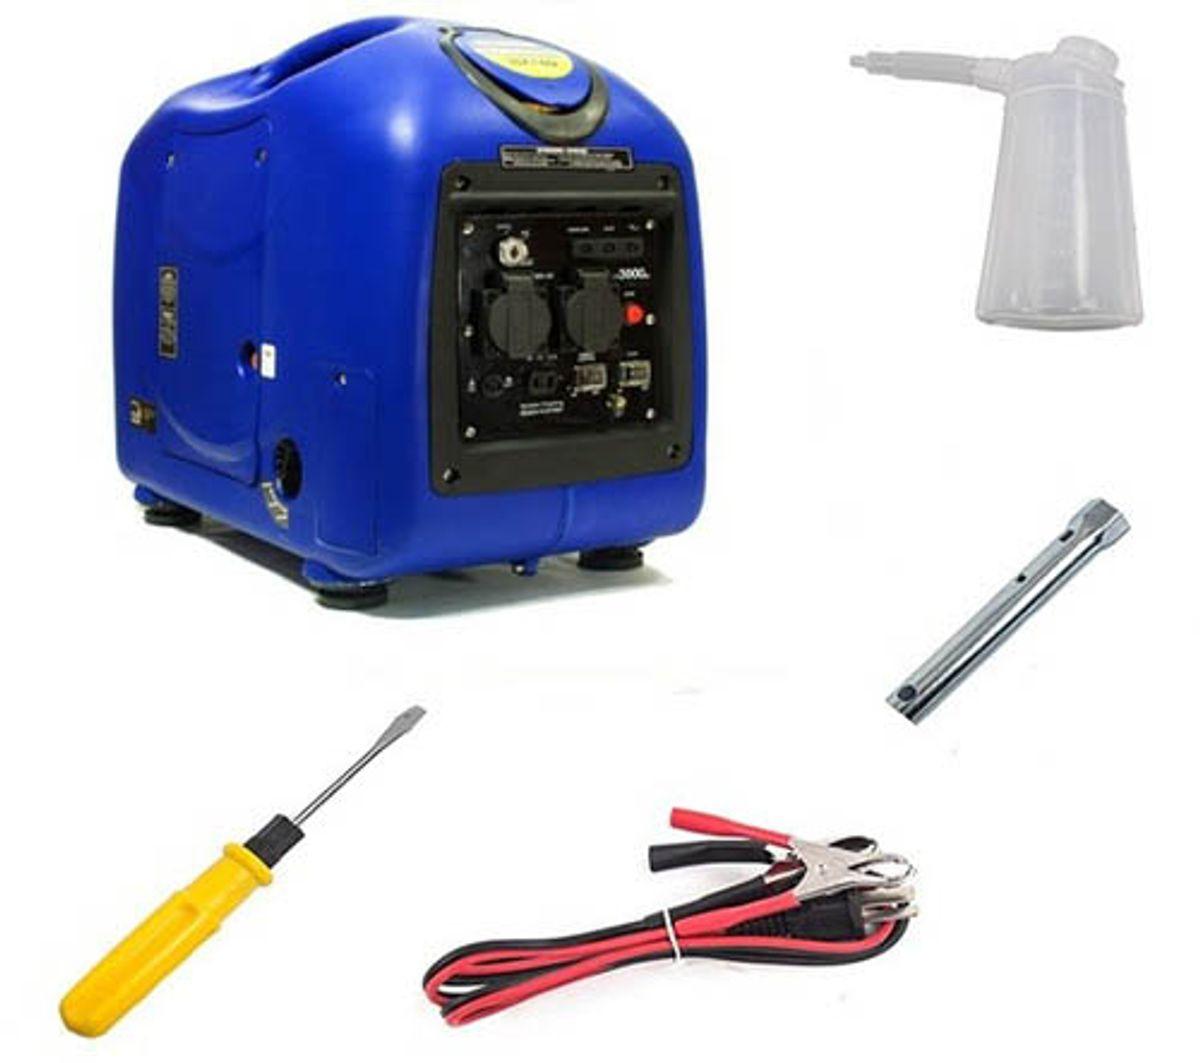 HYUNDAI HY3000SEi Inverter Aggregat 3300W - Elektrisk start - Be